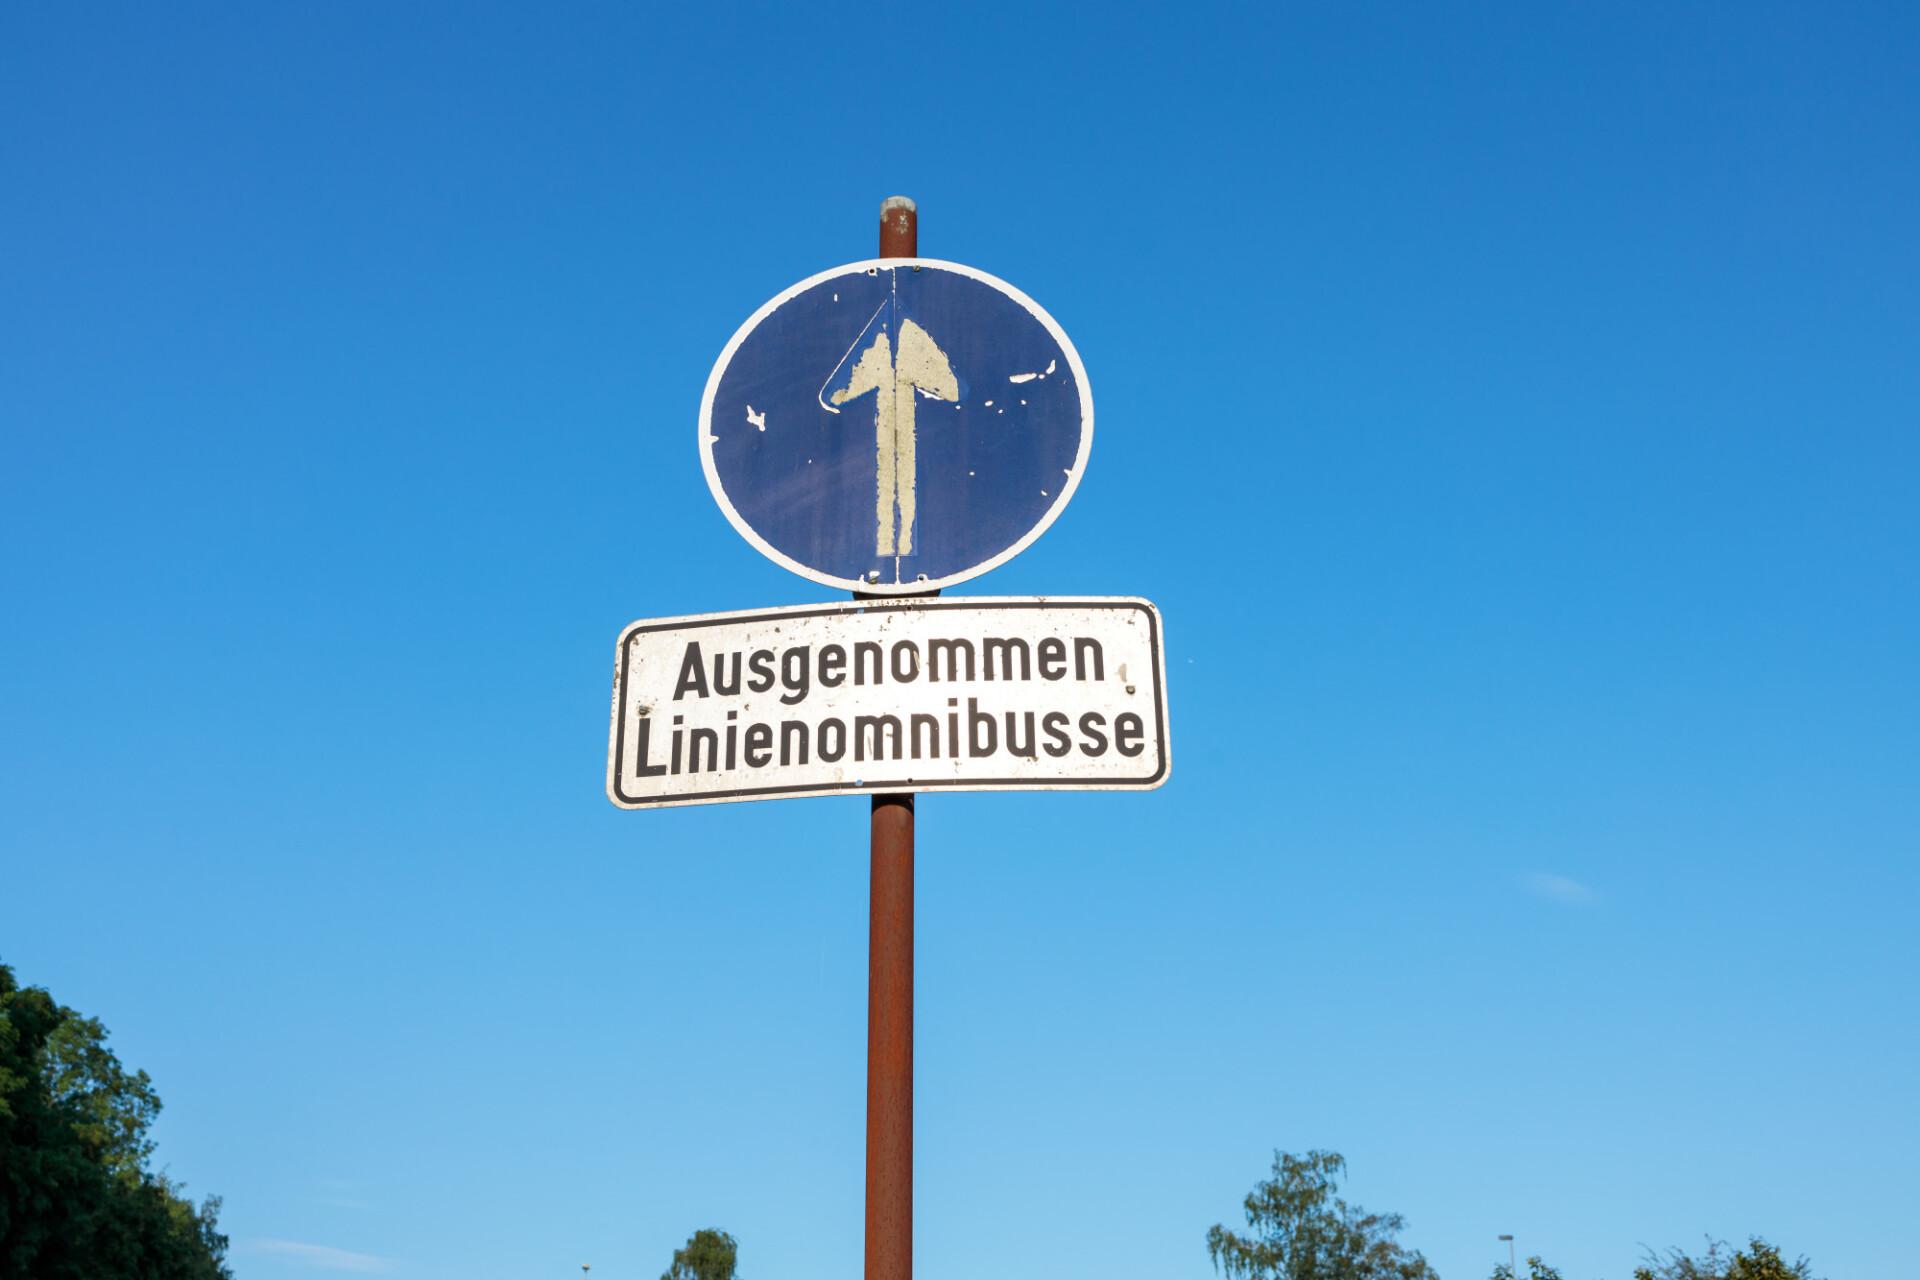 Up arrow street sign